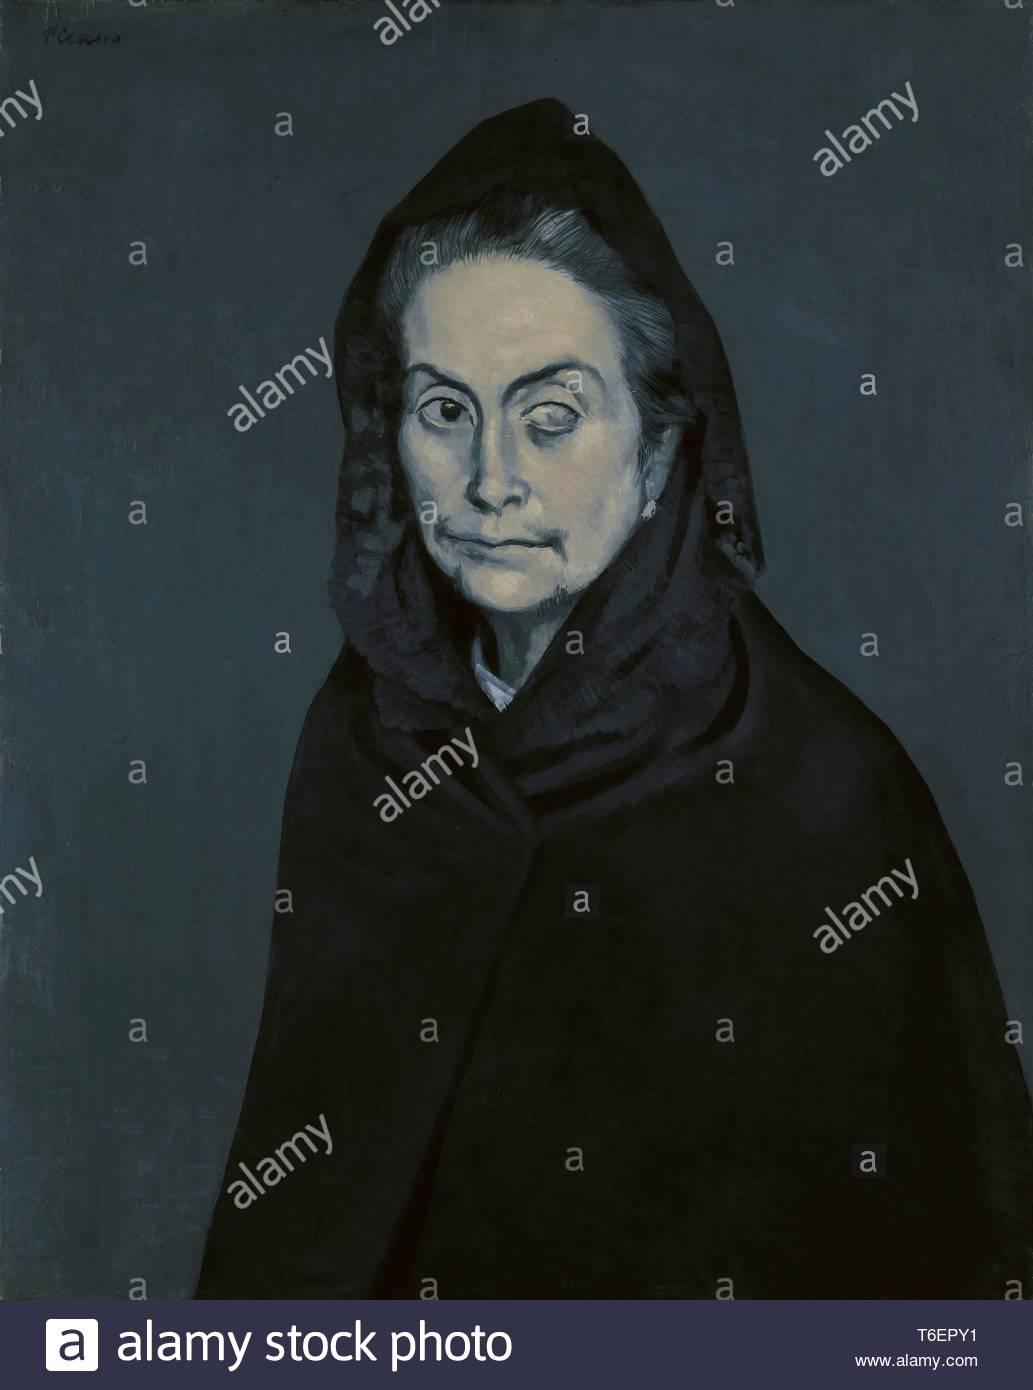 Pablo Picasso-Portrait de Carlota Valdivia (appele plus tard La Celestine) (La Celestina) - Stock Image